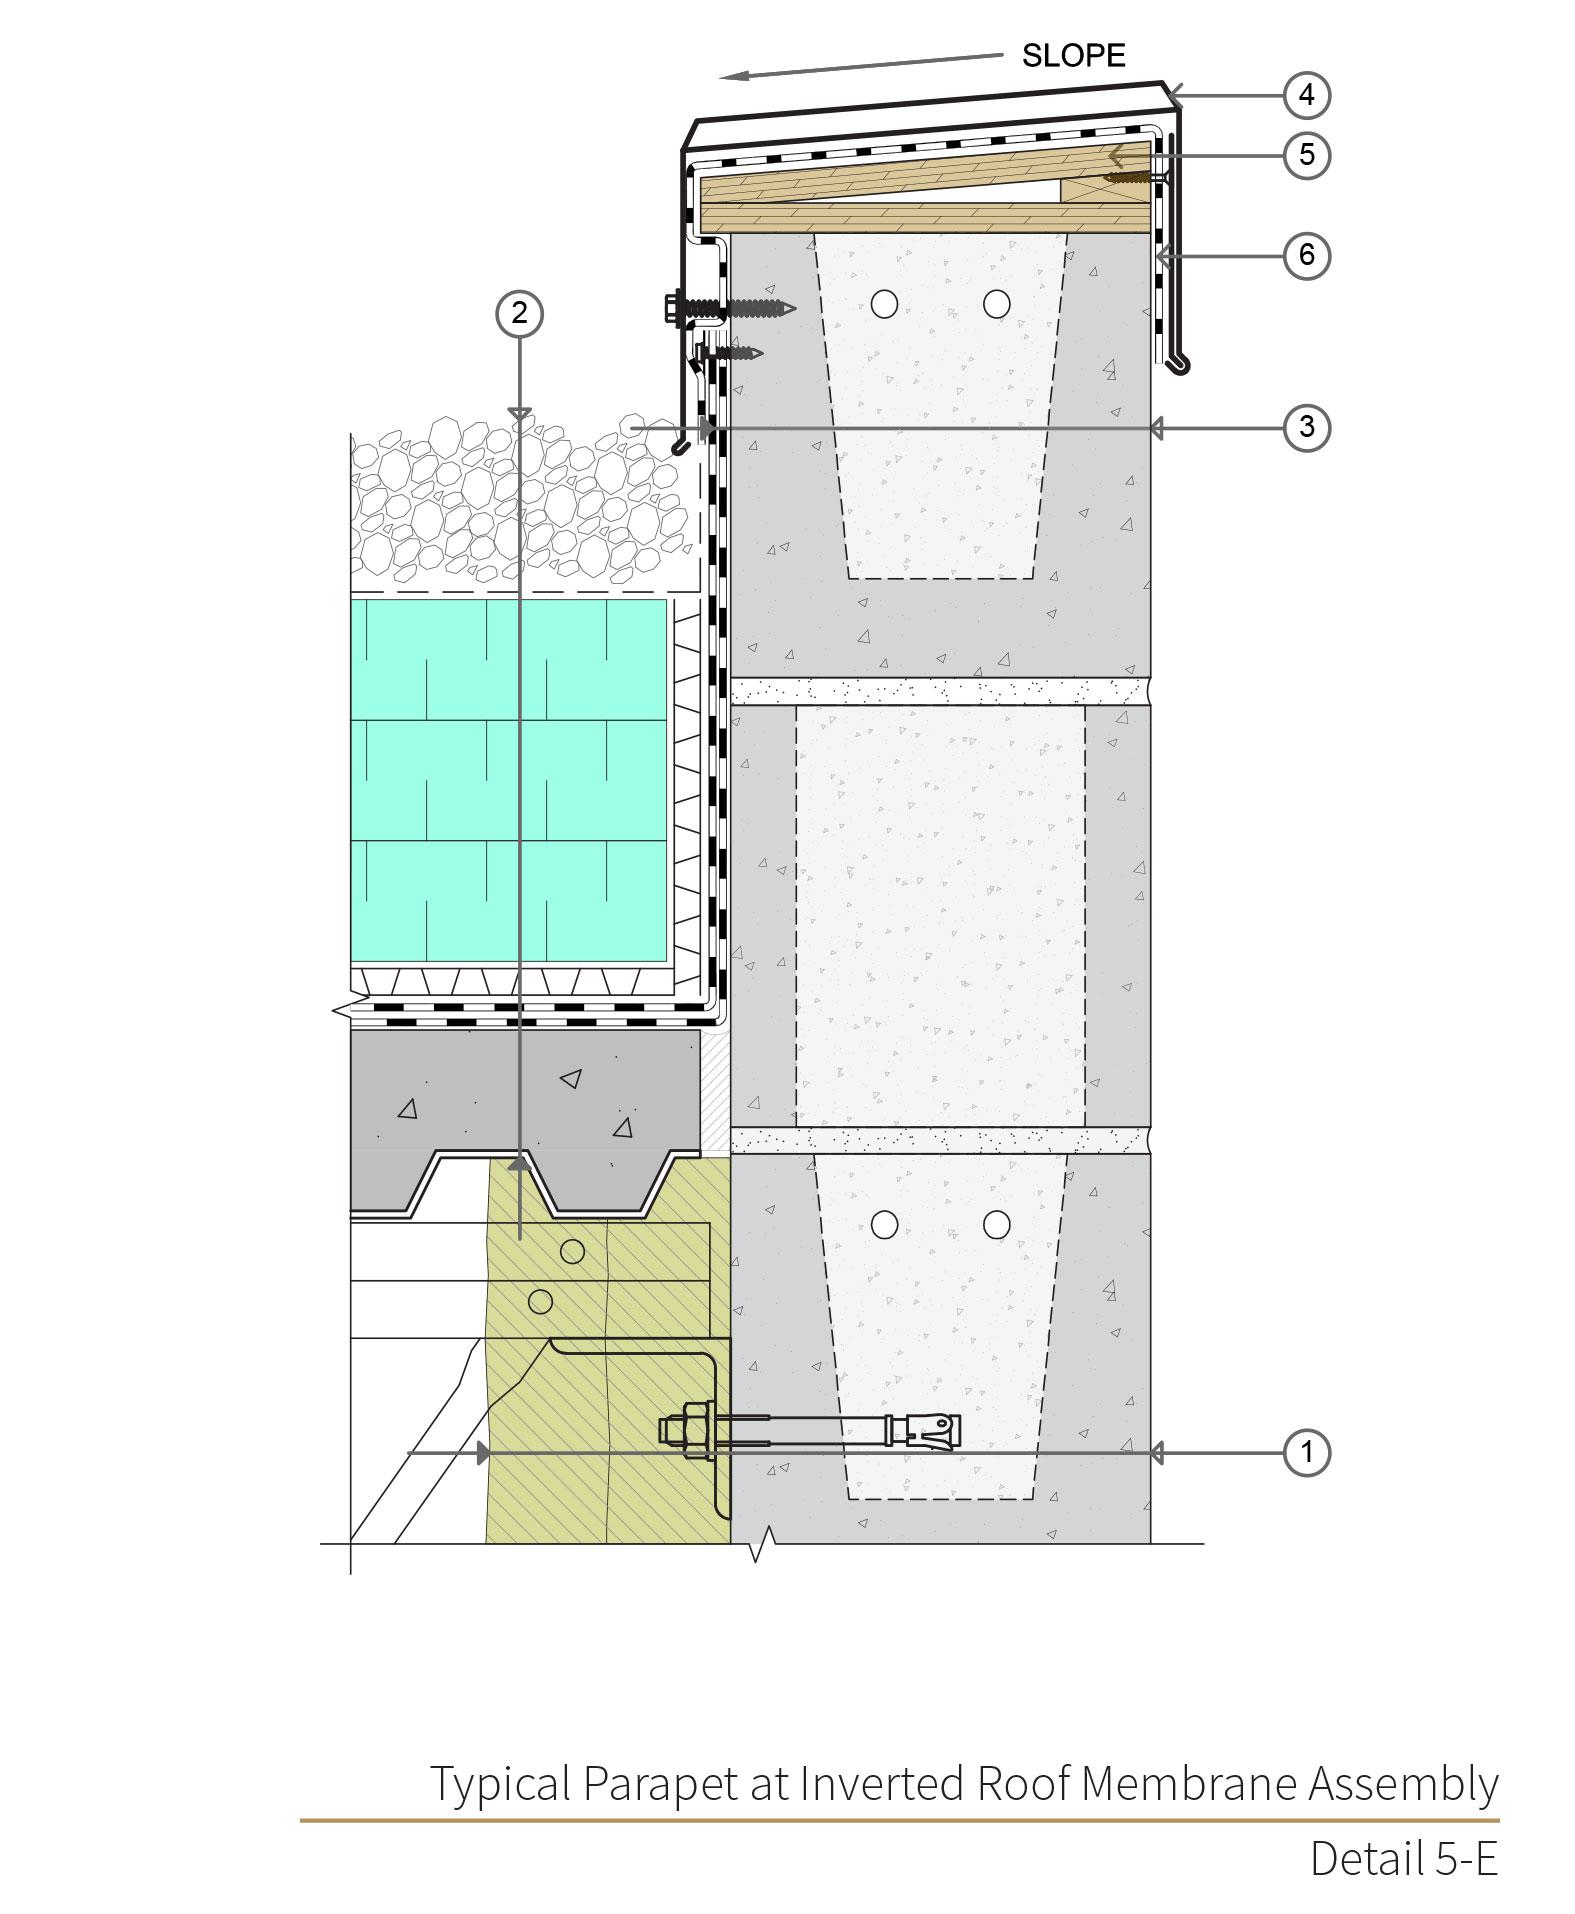 Assembly 5 Detail 5E